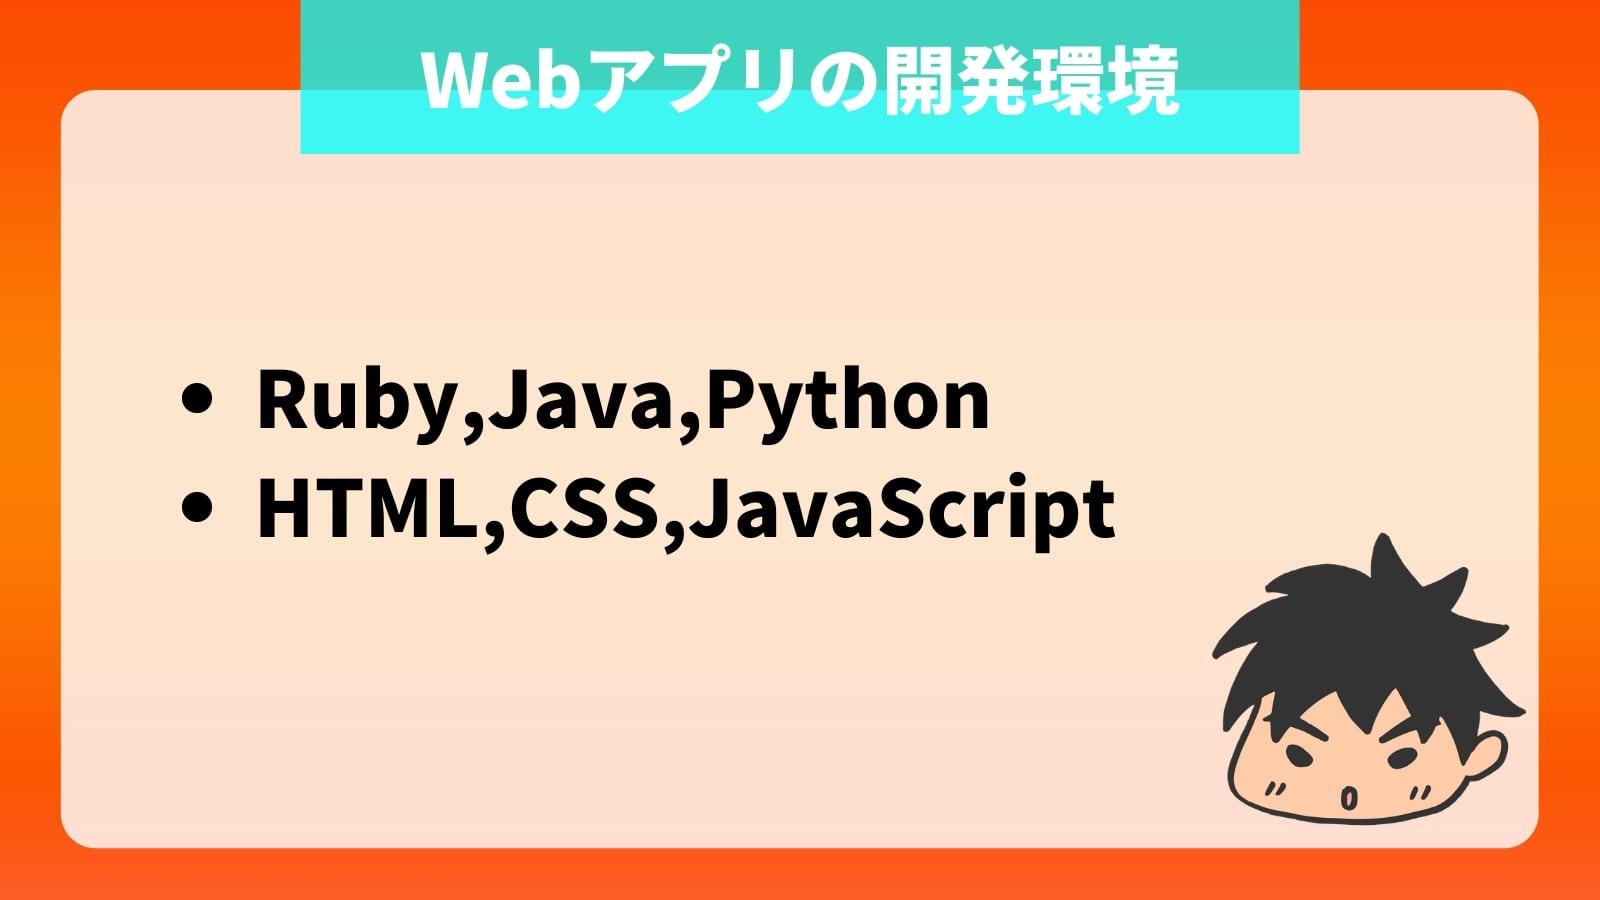 Webアプリの開発環境